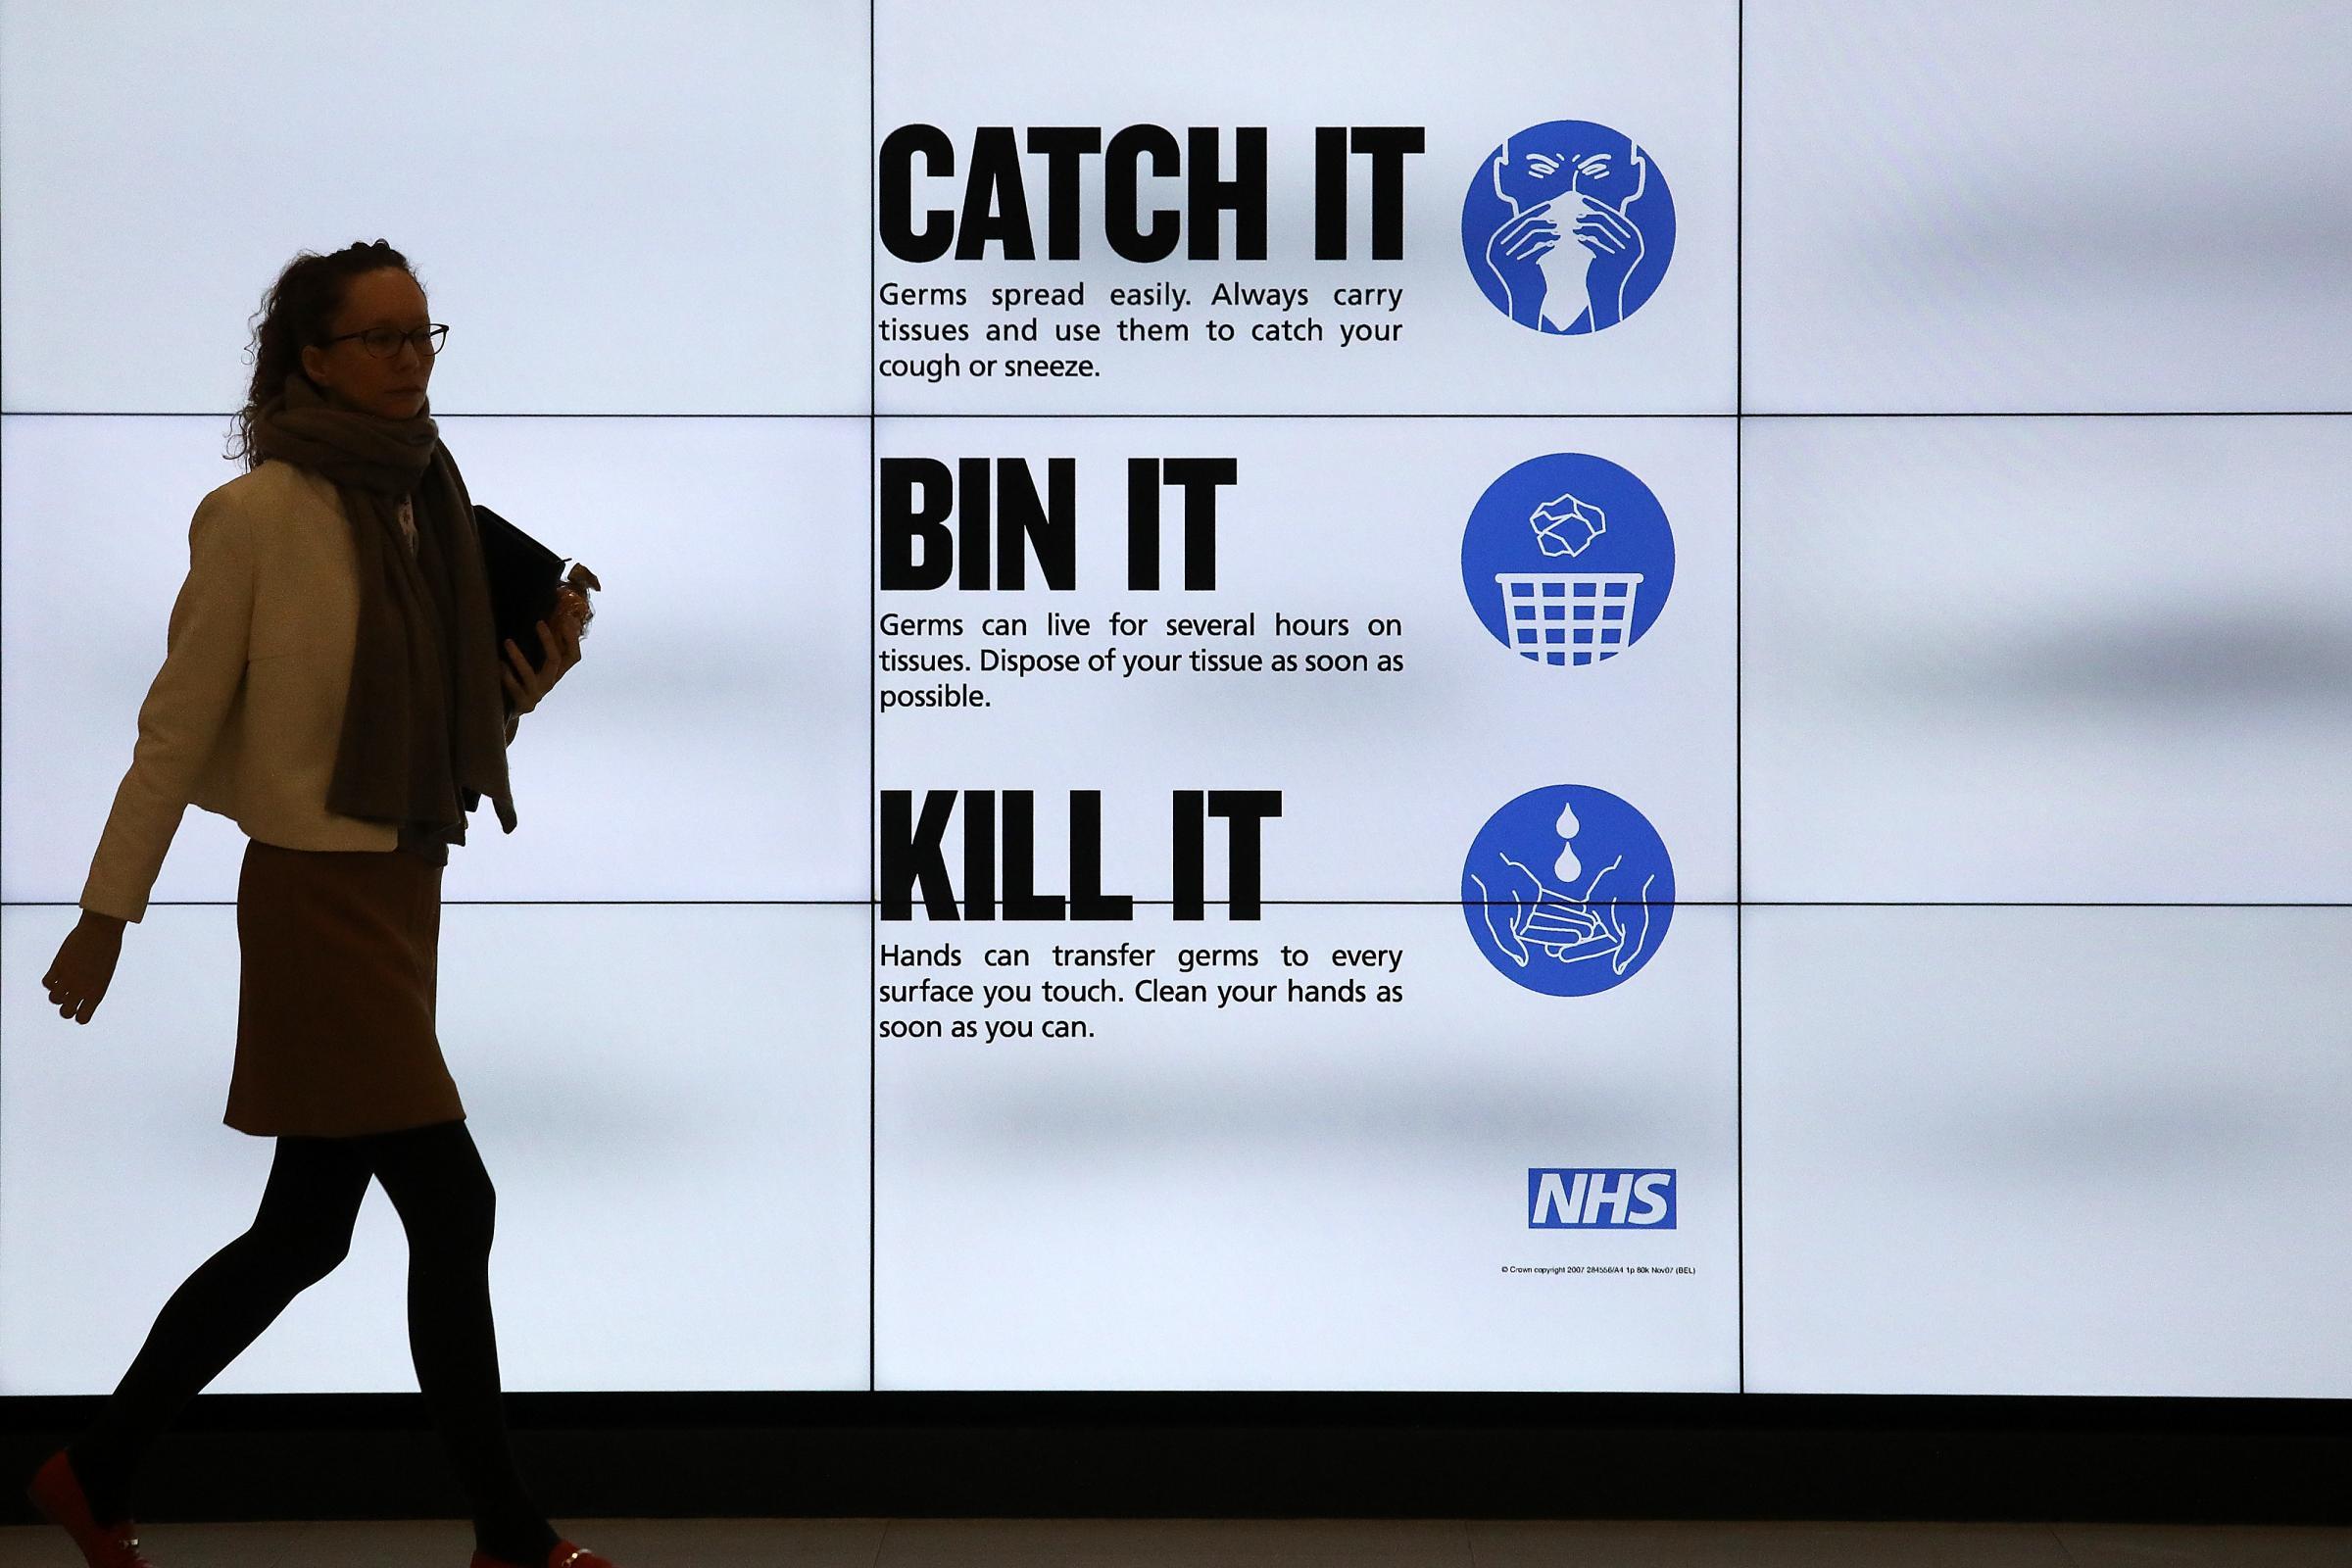 Coronavirus: First patient dies in UK as cases double in 48 hours ...